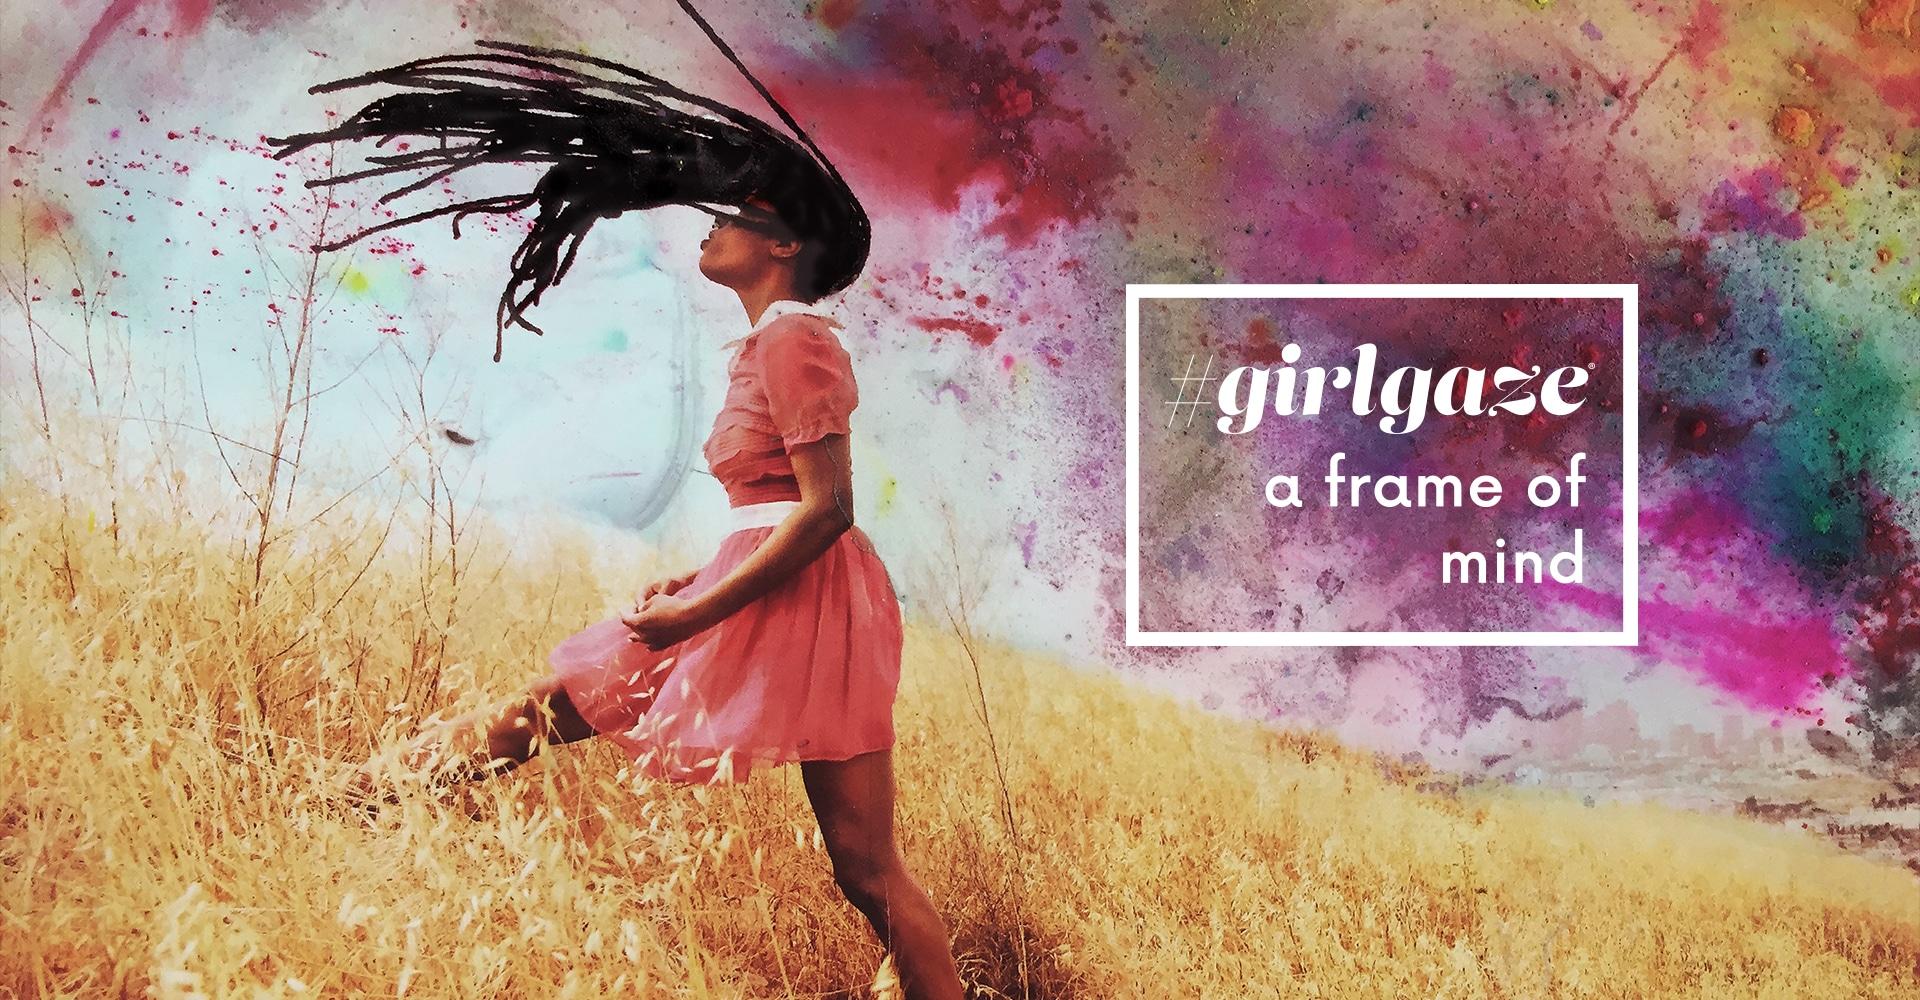 #girlgaze: a frame of mind